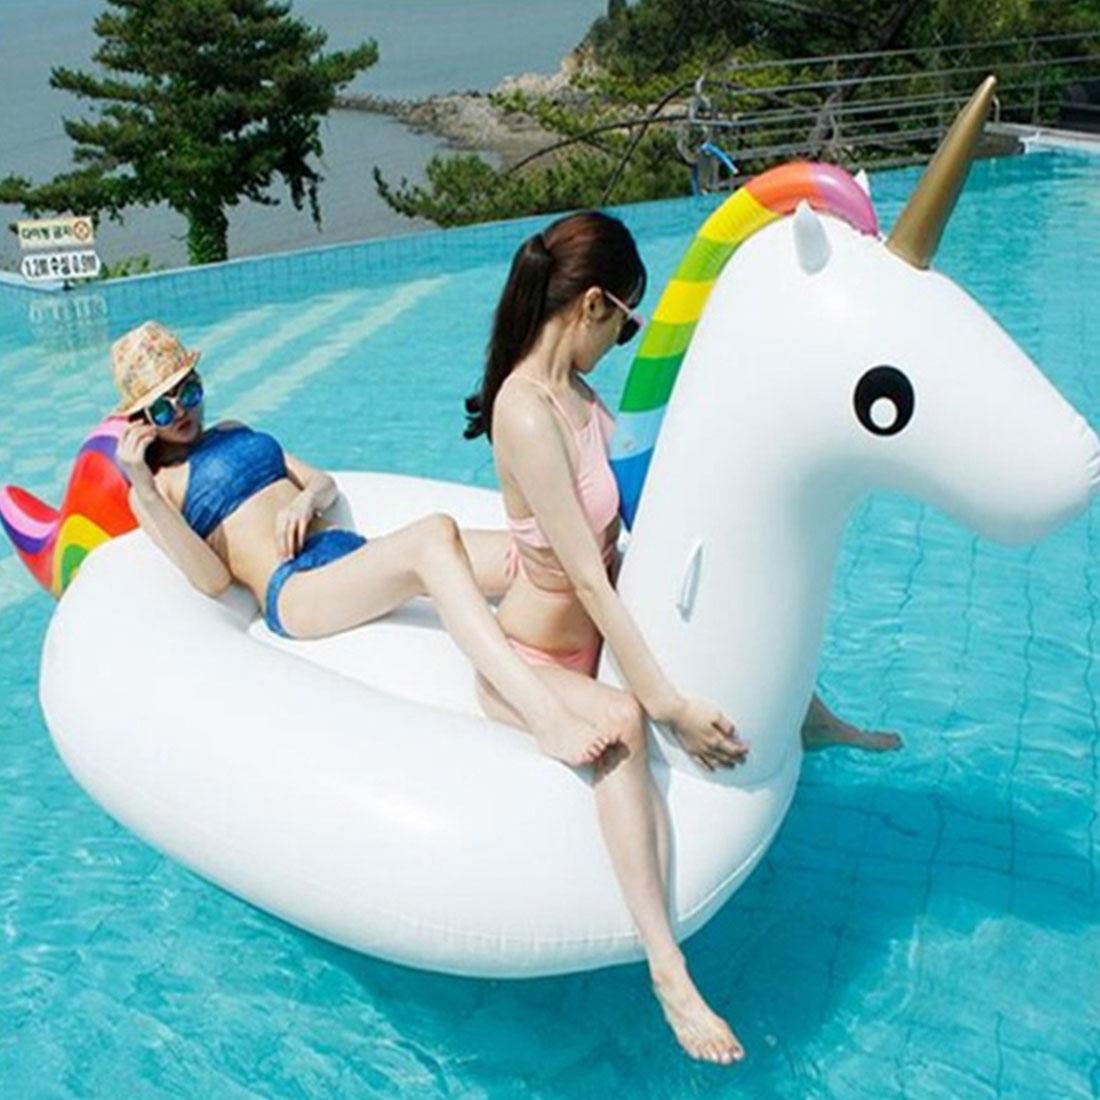 200 CM piscine gonflable piscine jouets piscine flotteur piscine flotteur Tube radeau enfant opblaasbare zwembad speelgoed